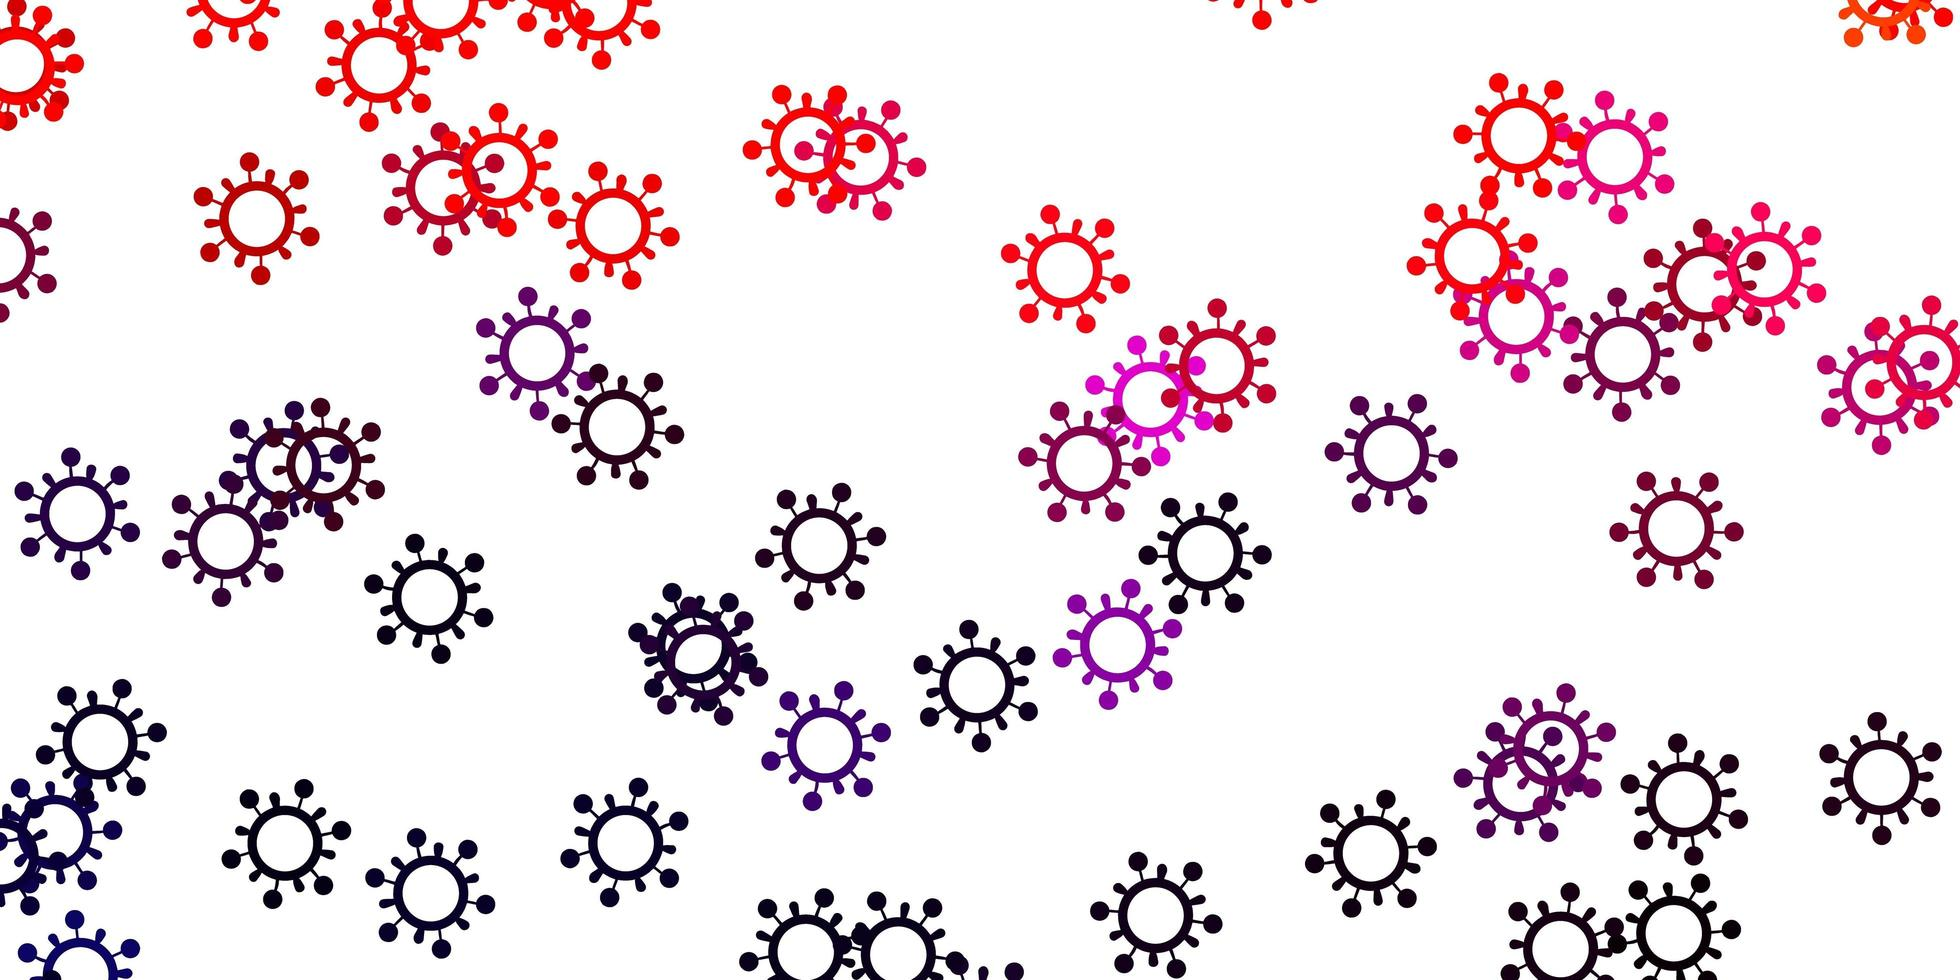 hellrosa, roter Vektorhintergrund mit Virensymbolen. vektor